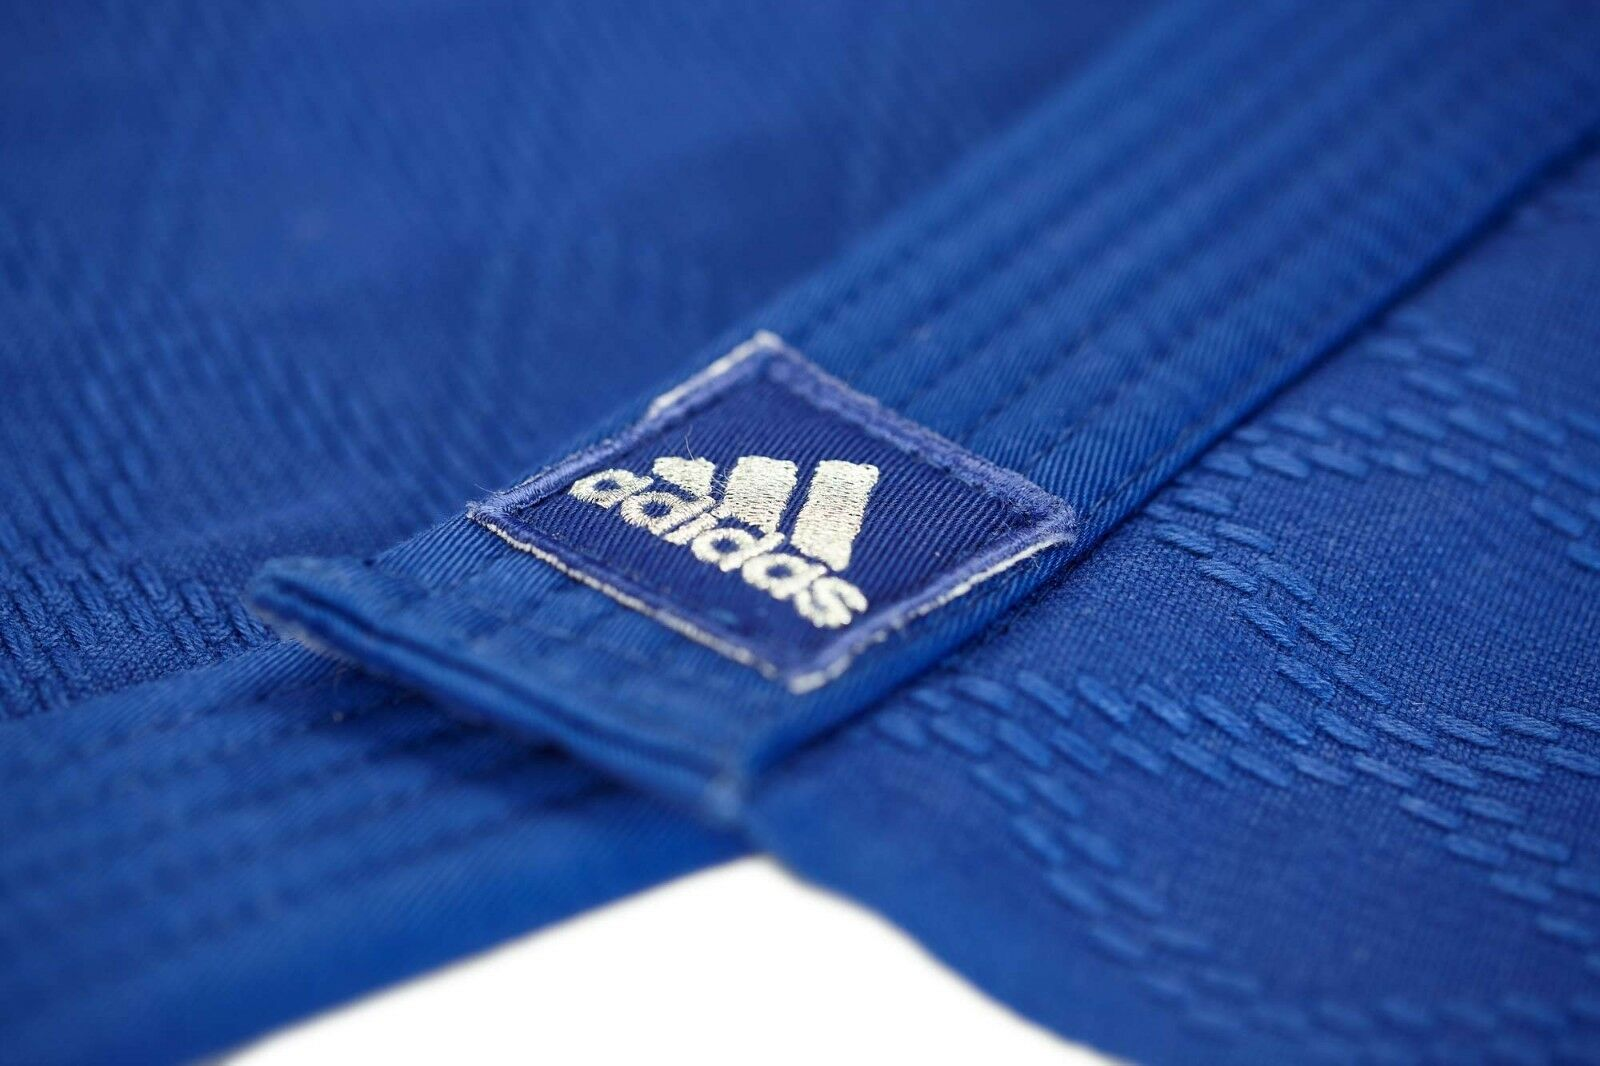 Adidas Judo-Anzug  Millenium  blau silbernes Logo - - - J990B - Judo-Anzug - Judo-Gi 477f6c